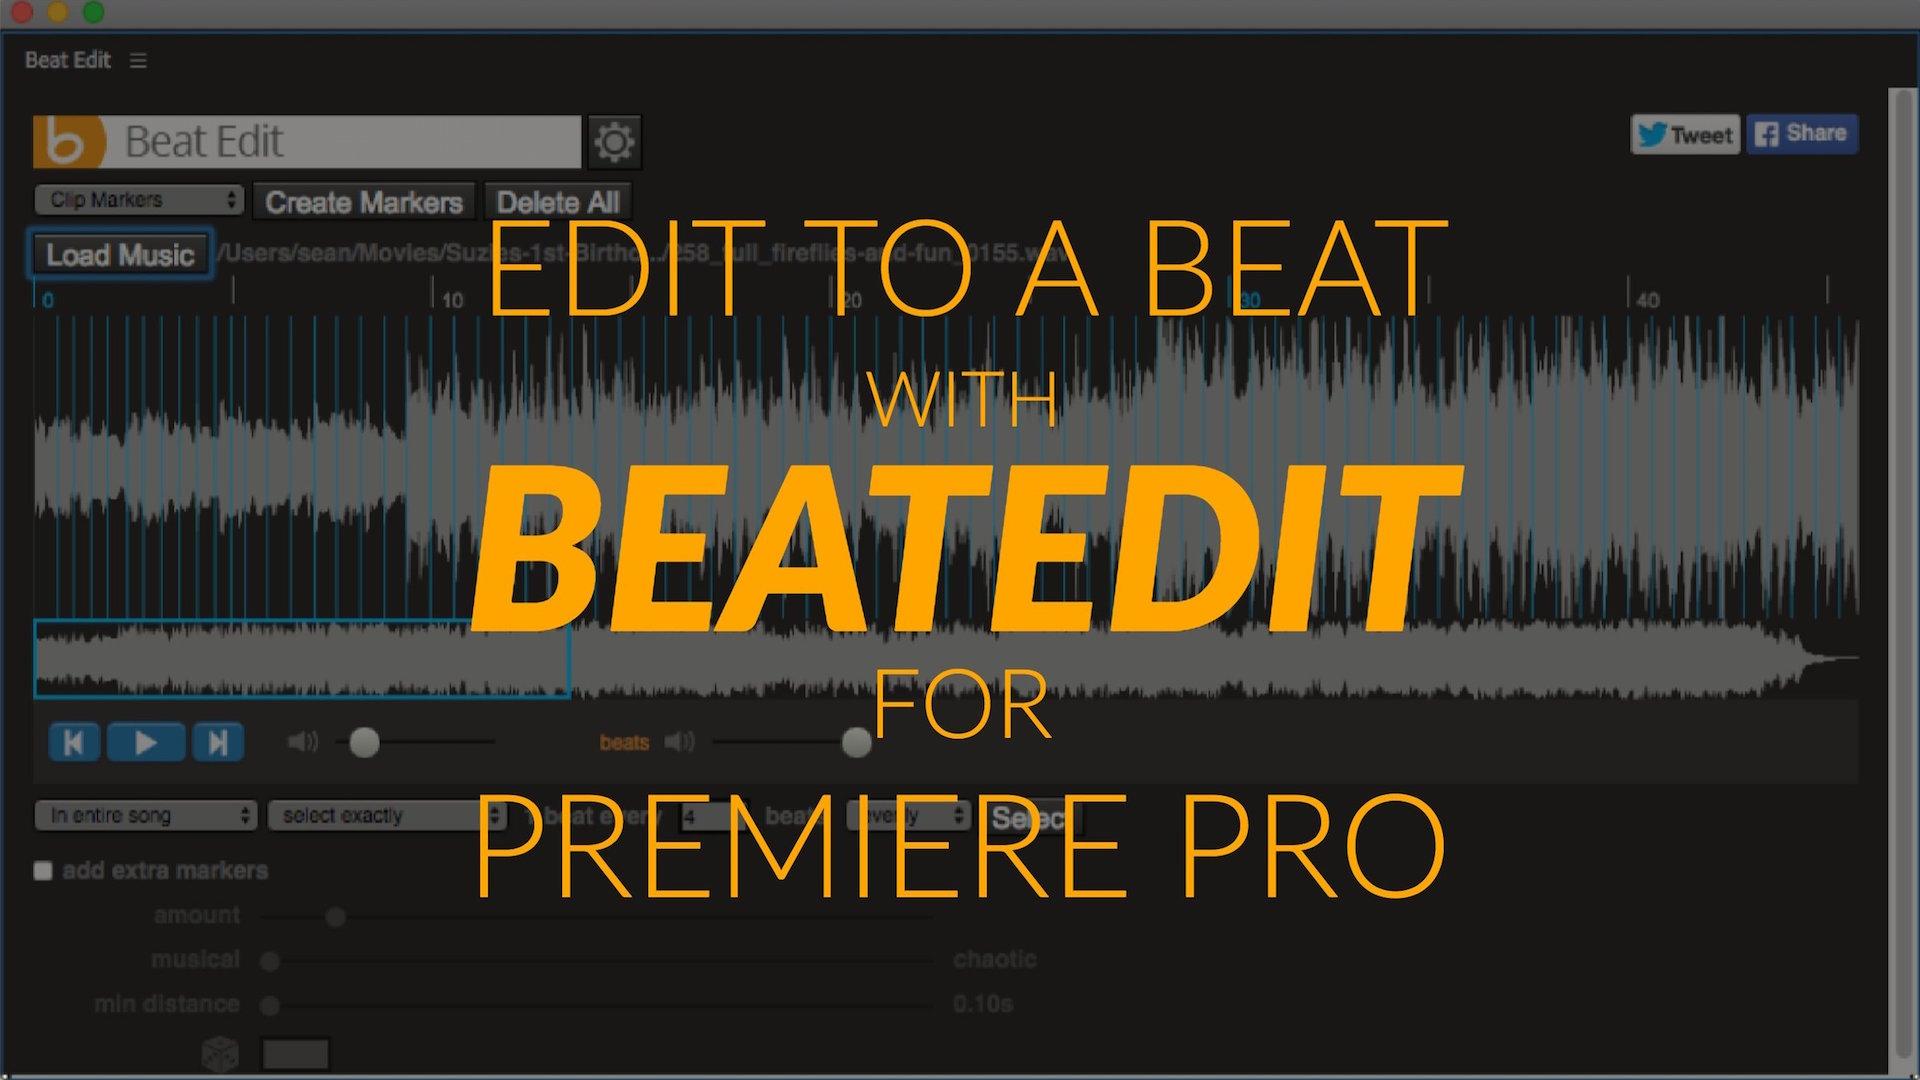 edit-to-a-beat-beatedit-premiere-pro.jpg